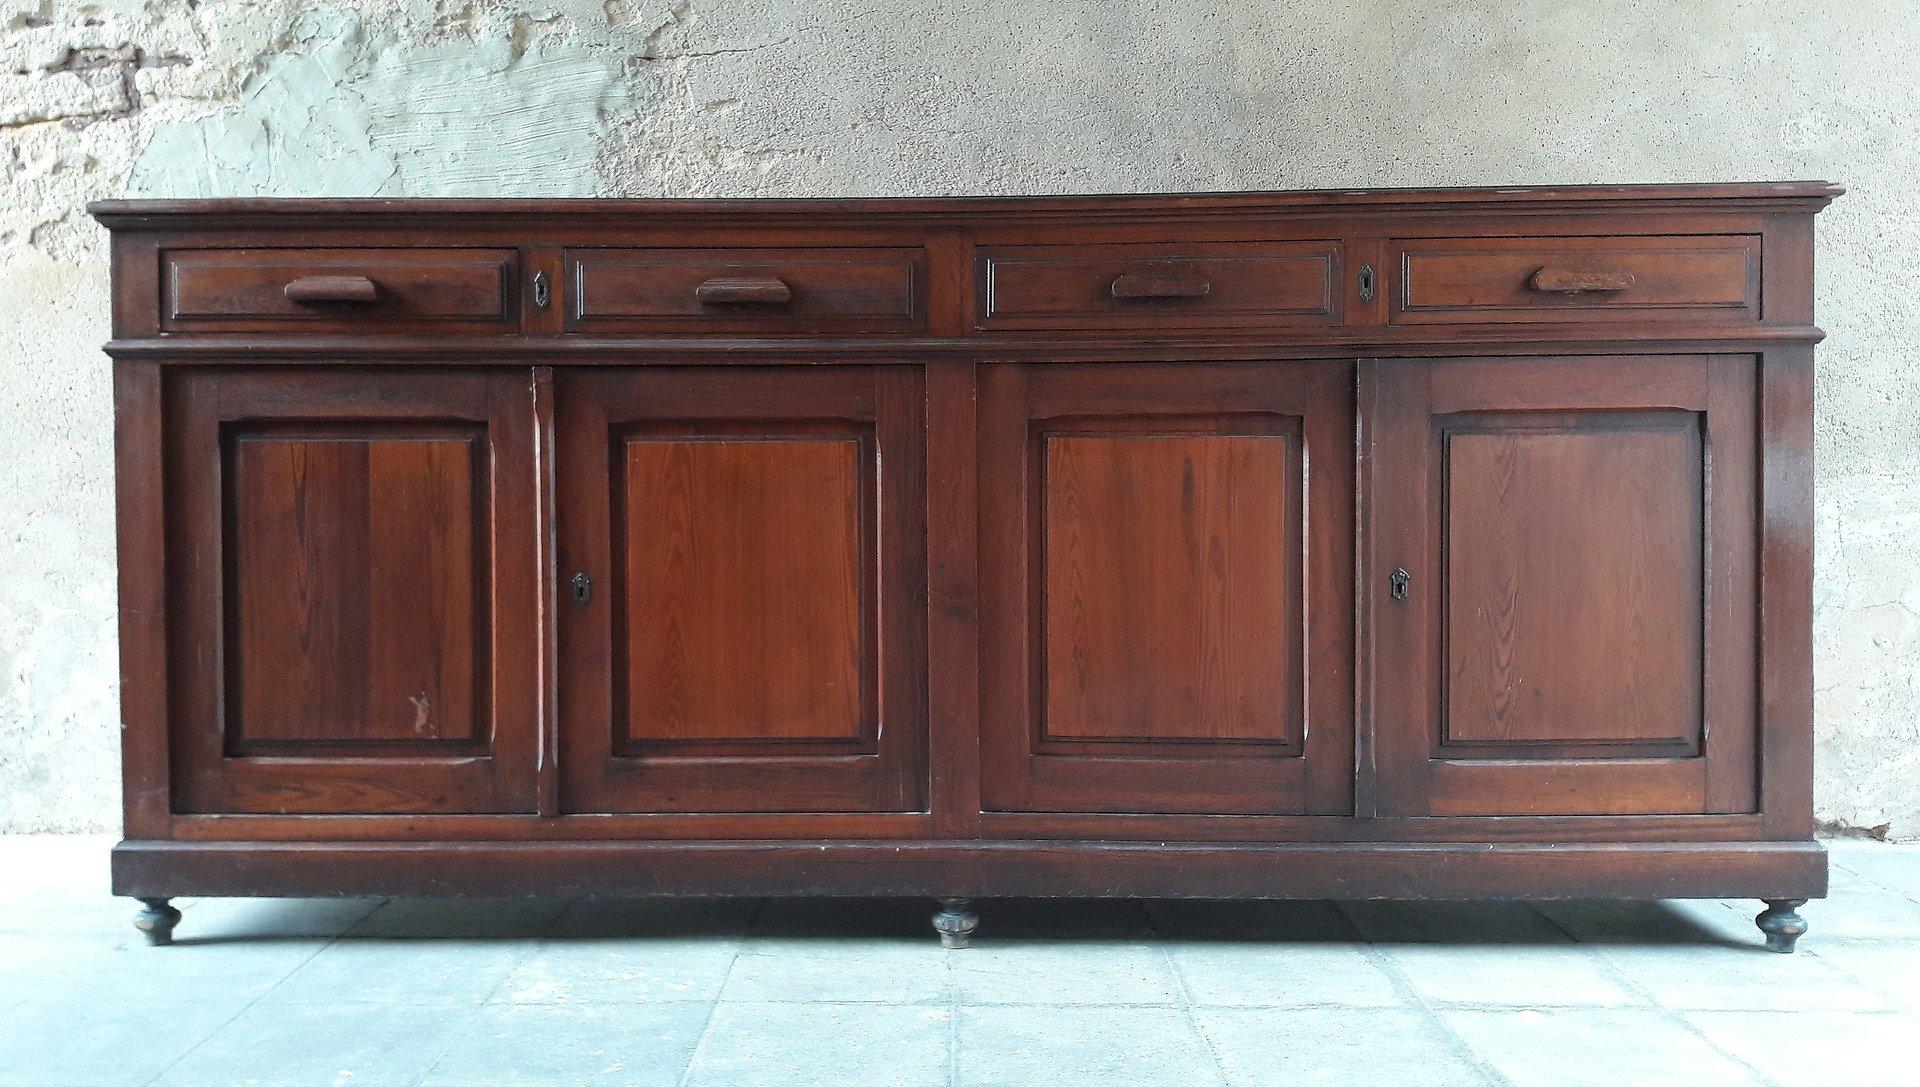 gro er belgischer laborschrank 1930er bei pamono kaufen. Black Bedroom Furniture Sets. Home Design Ideas